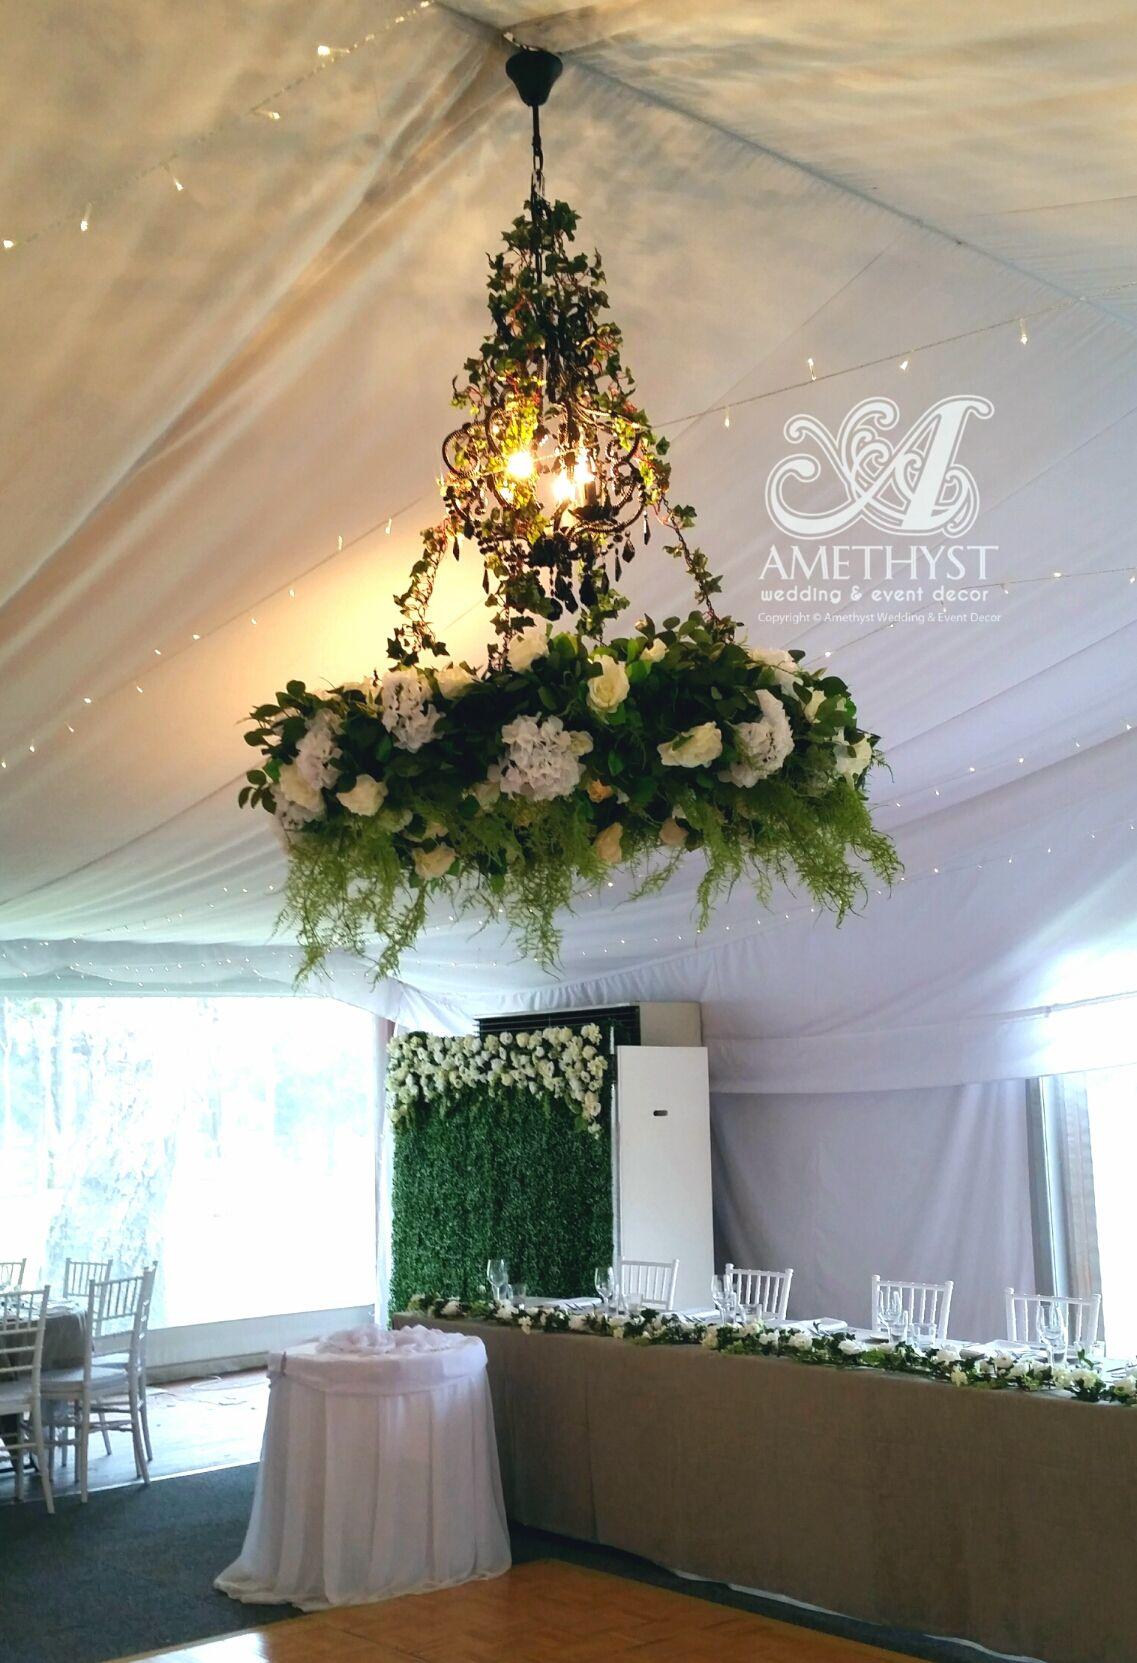 Floral chandelier green white 150diy hire amethyst wedding floral chandelier green white 150diy hire amethyst wedding event arubaitofo Choice Image